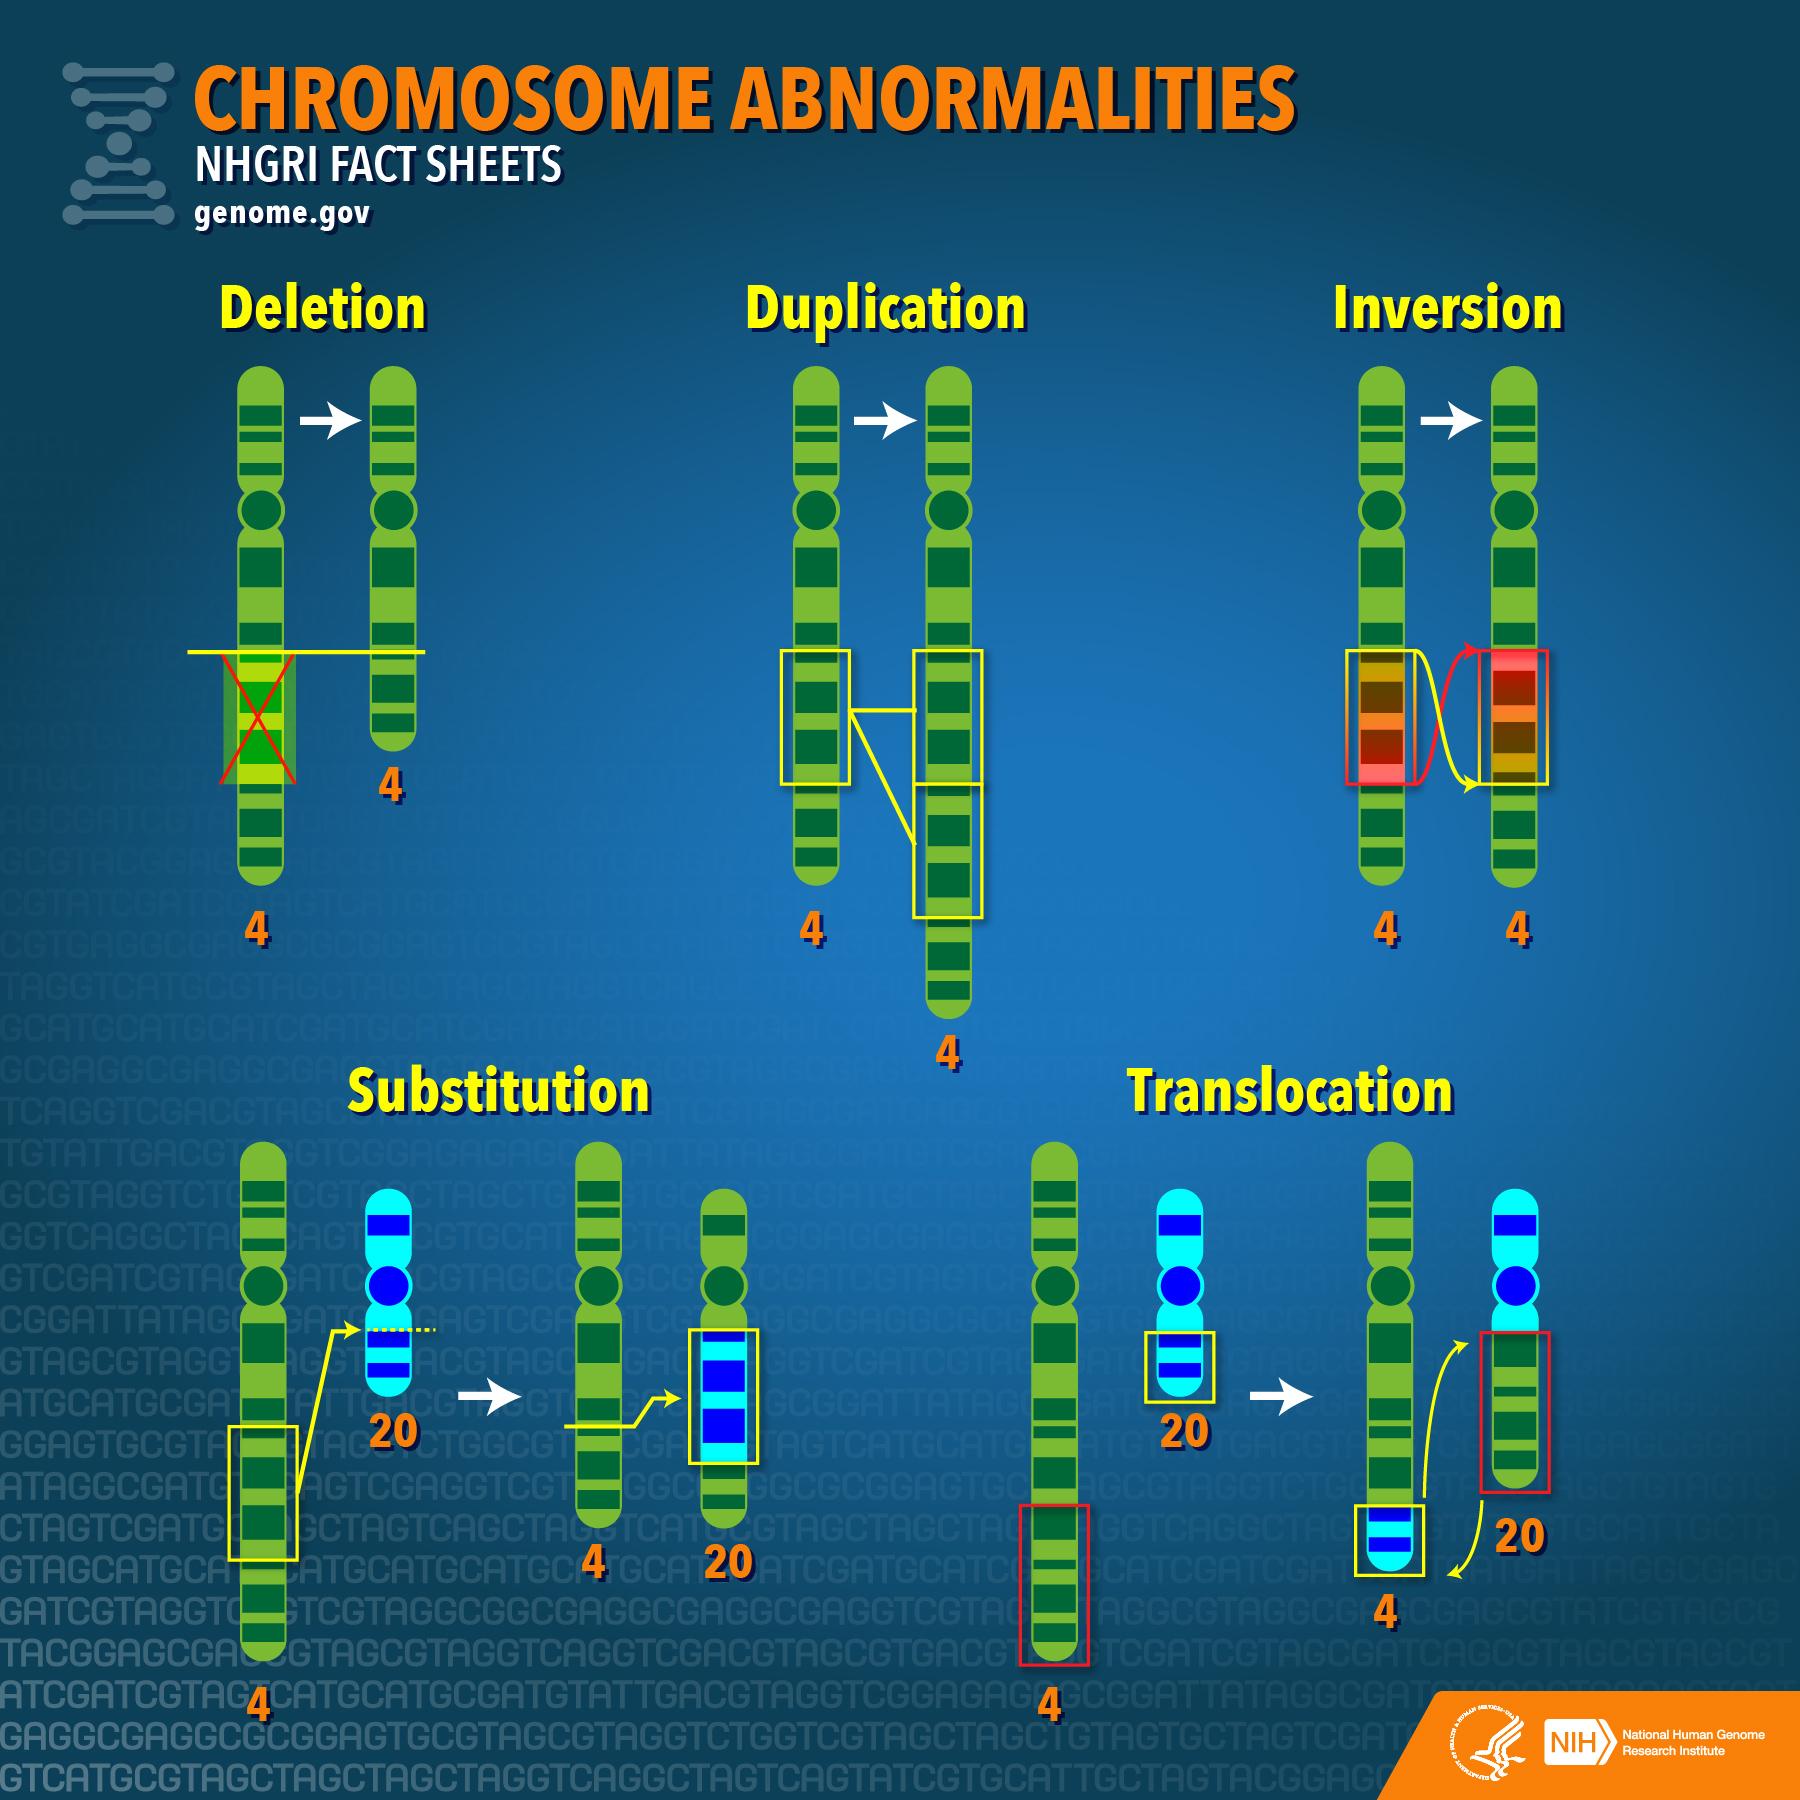 Chromosome Abnormalities Fact Sheet